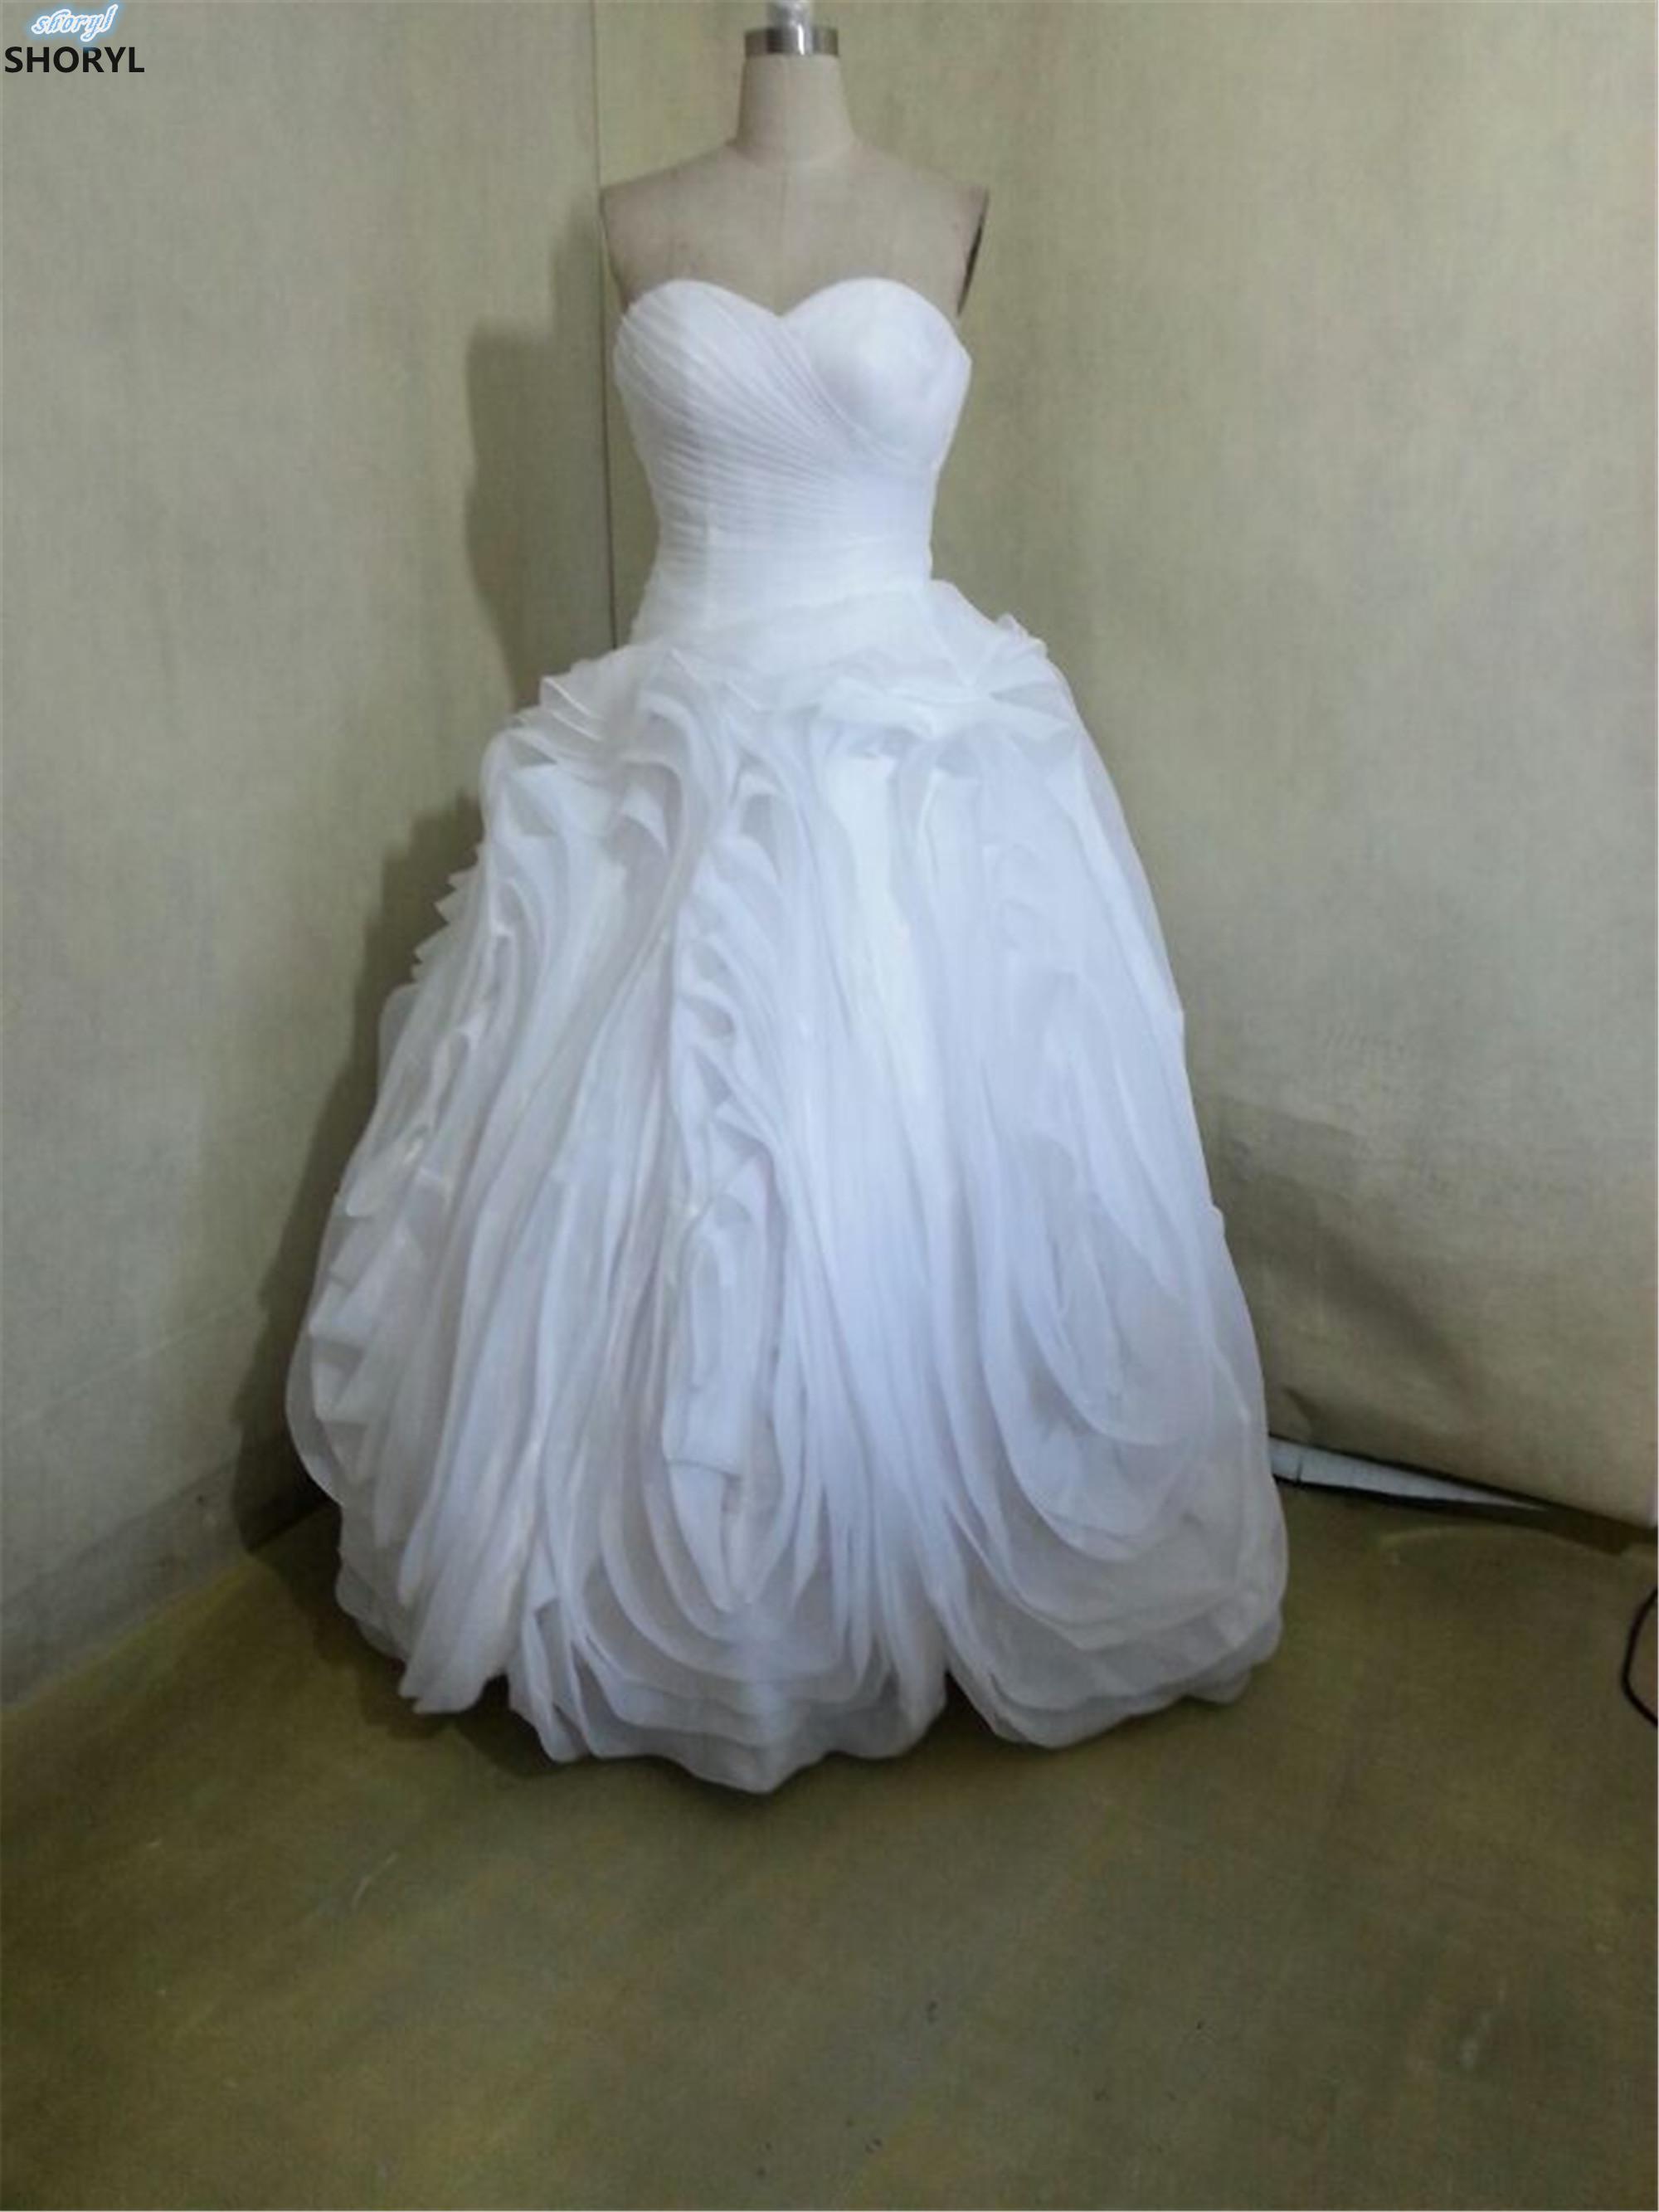 wedding dresses c97 wedding dress shop online Princess Strapless Knee length Sleeveless Lace Wedding Dress